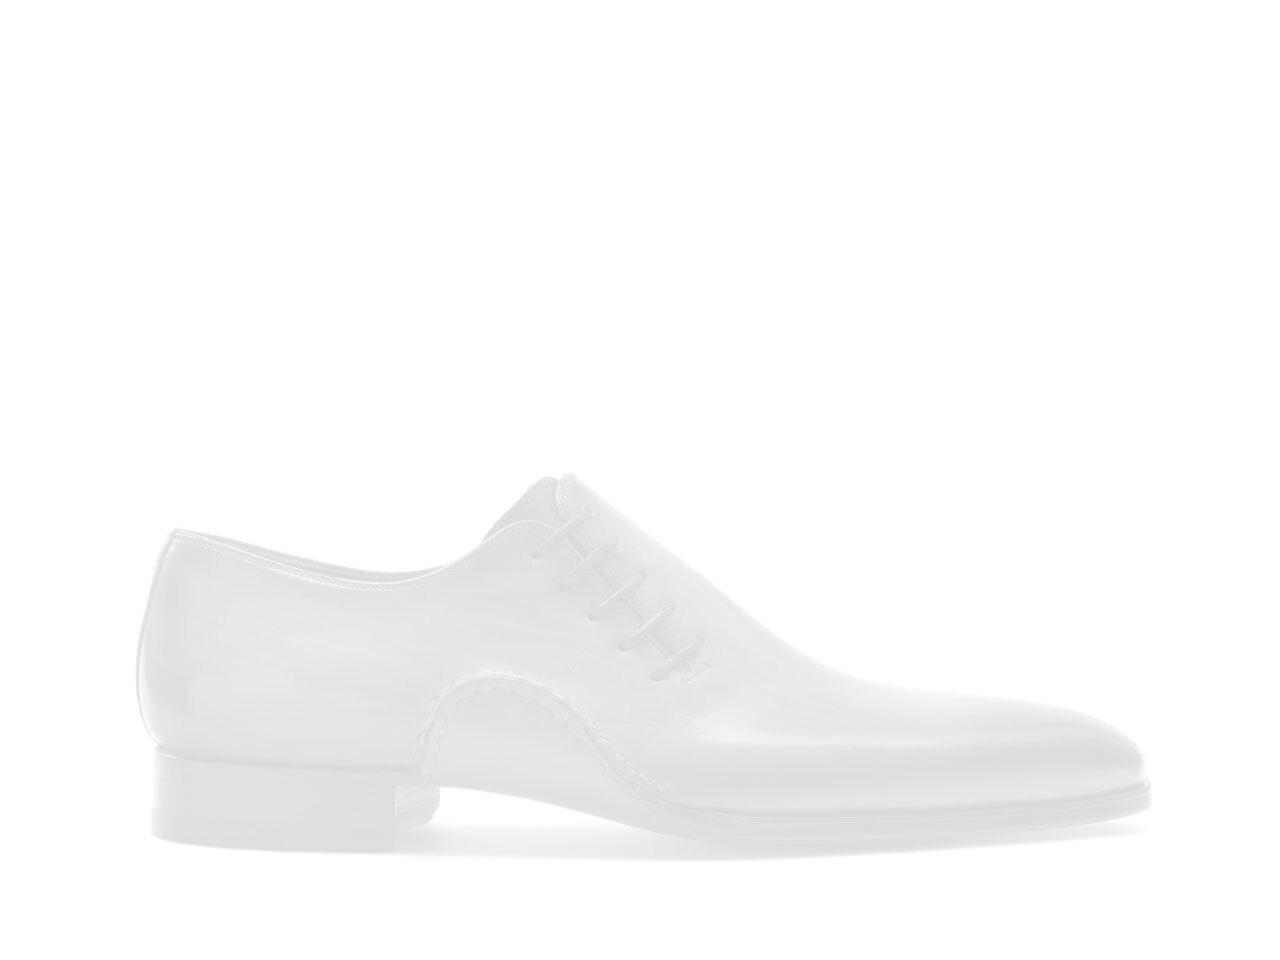 Sole of the Magnanni Camilo Black Men's Oxford Shoes